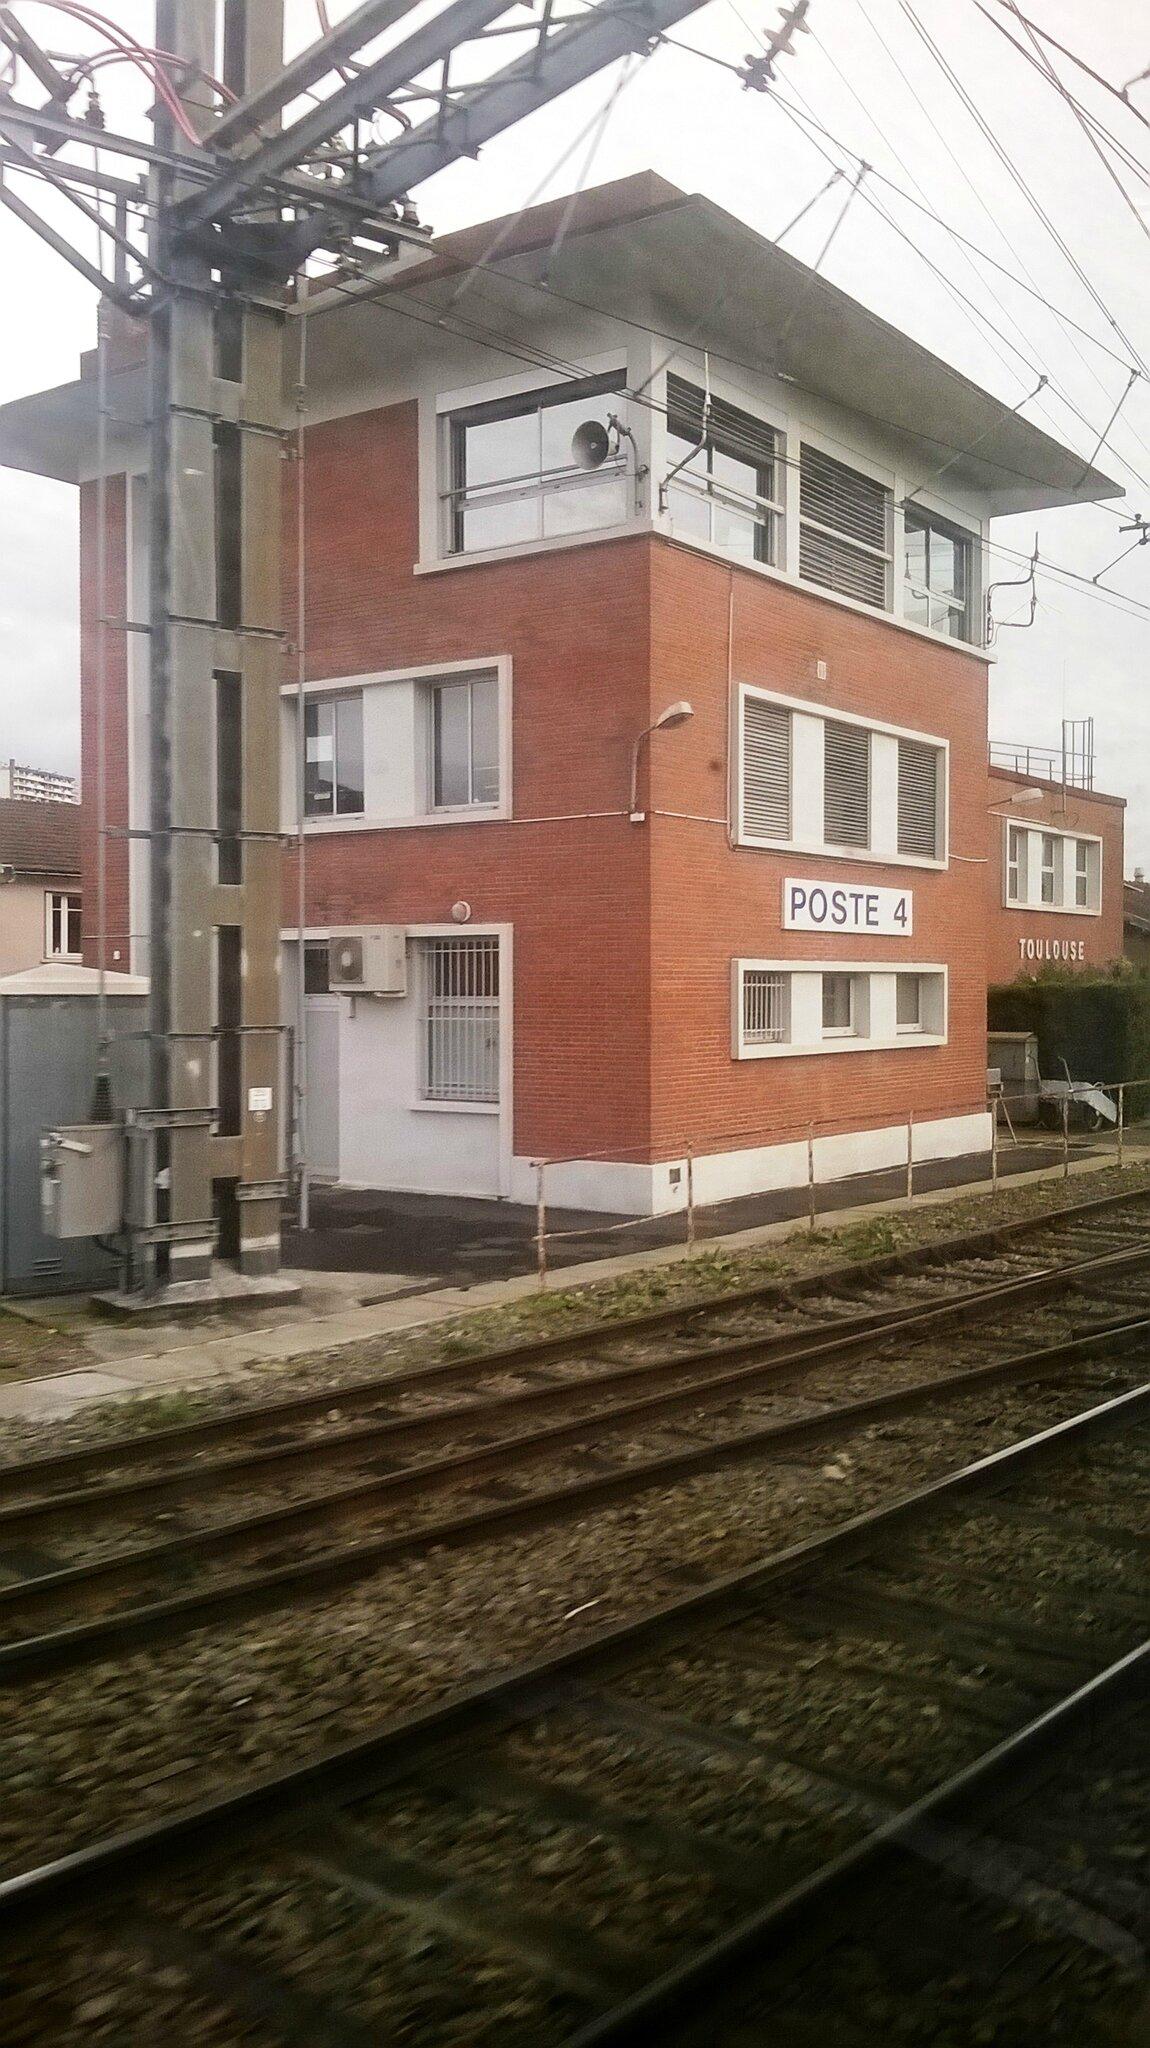 Toulouse (Haute-Garonne - 31) Poste 4